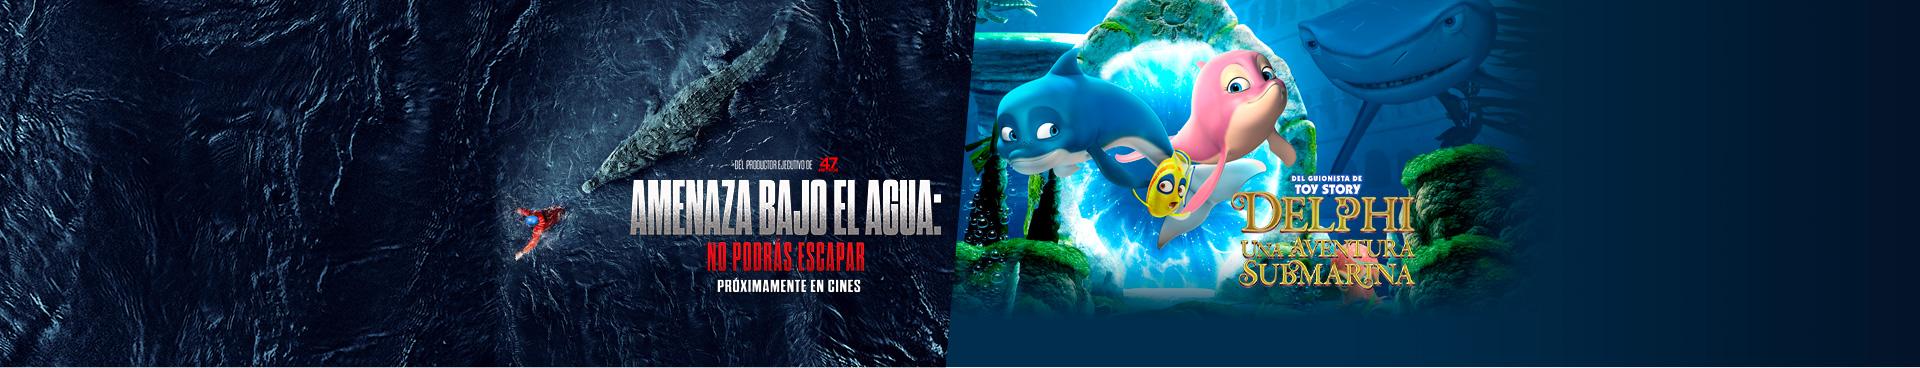 Amenaza bajo el agua / Delphi: Un aventura Submarina